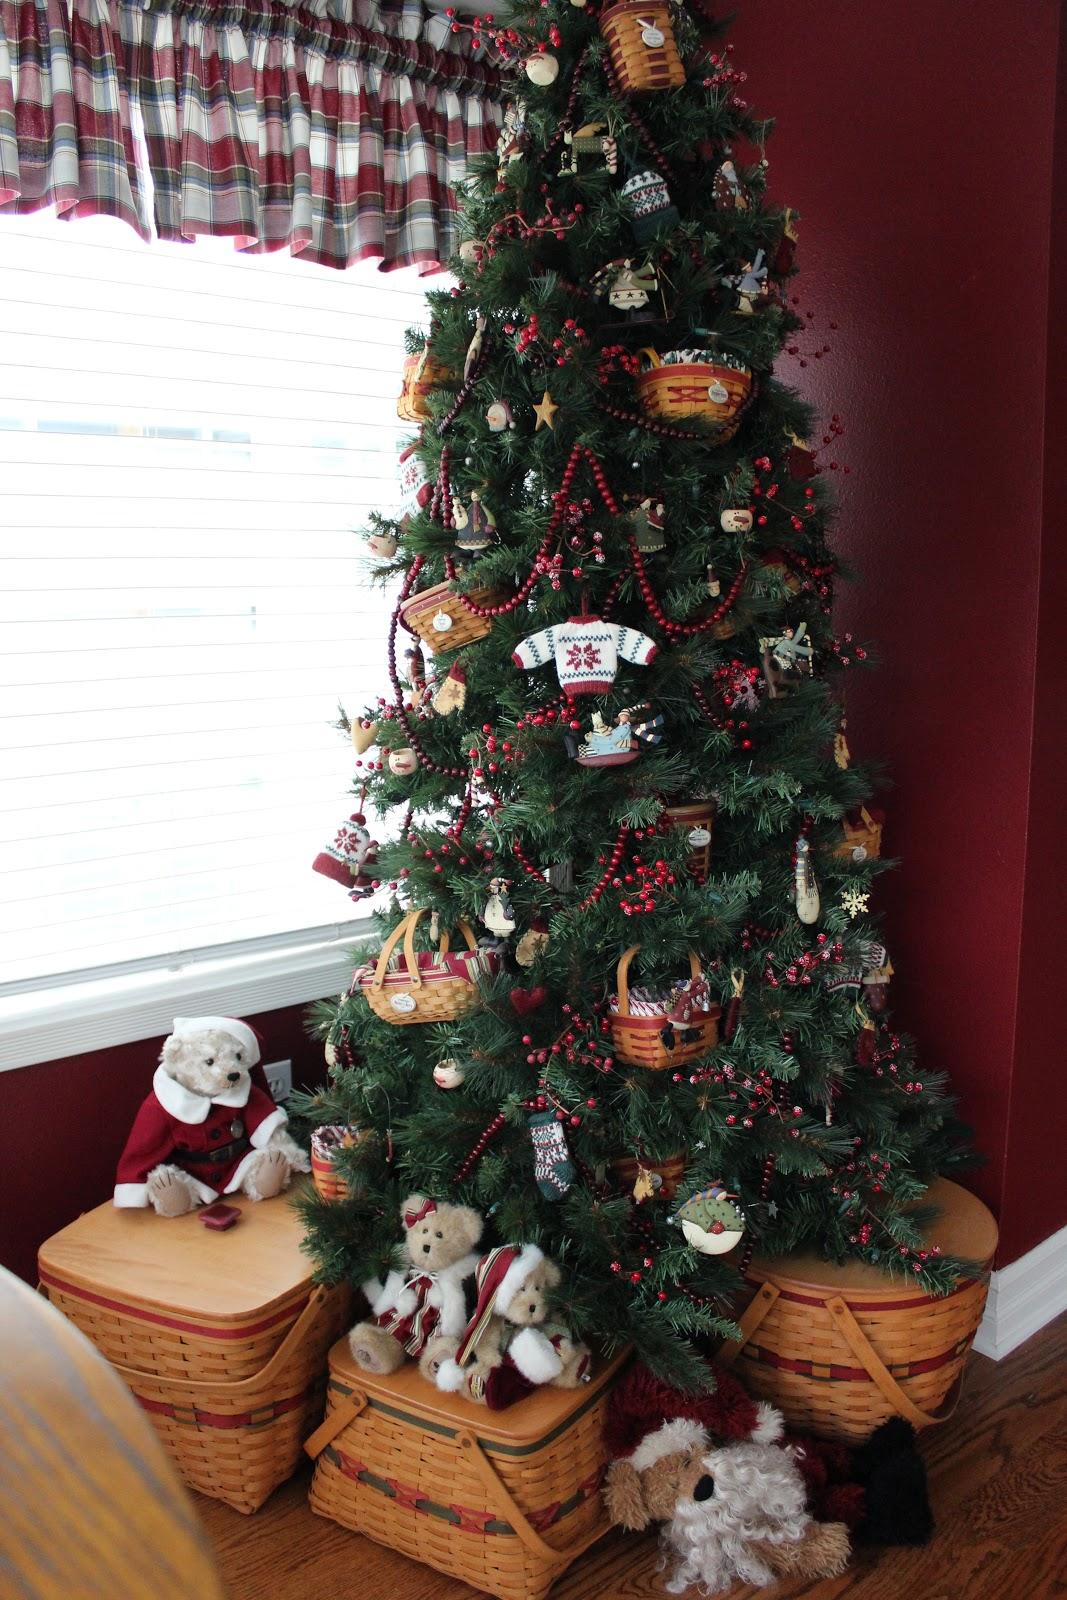 The Plaid Basket A Longaberger HollyWilliraye And Wishes Christmas